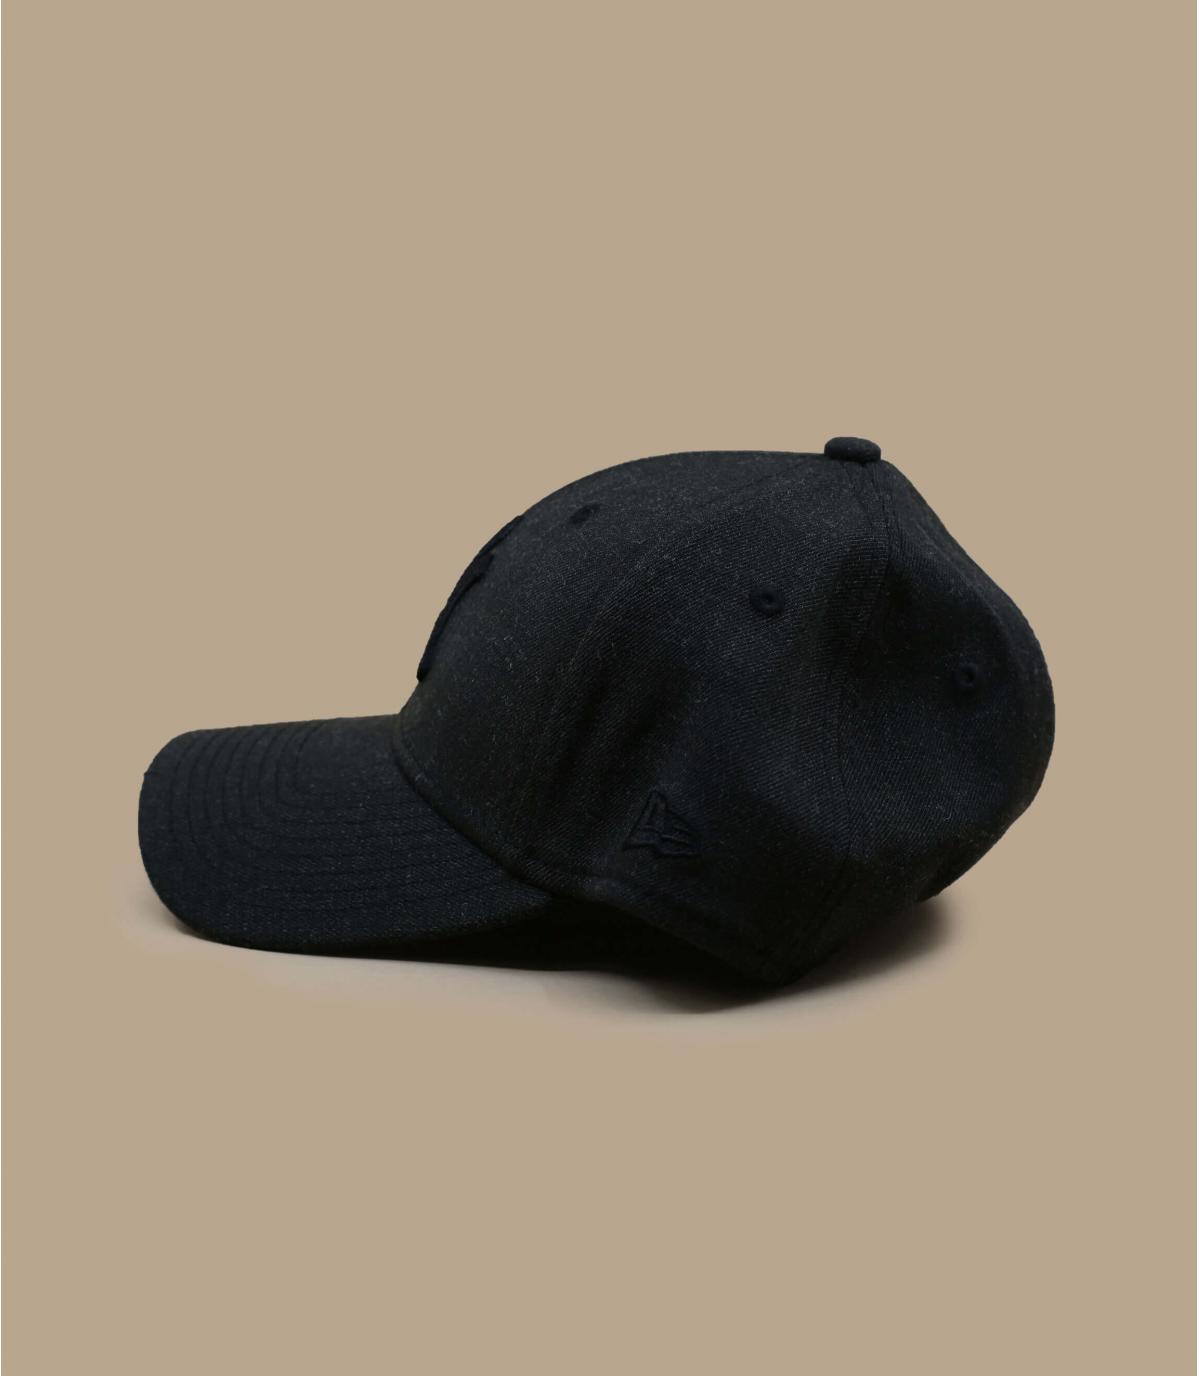 Dettagli MLB melton 9Fifty NY black - image 3